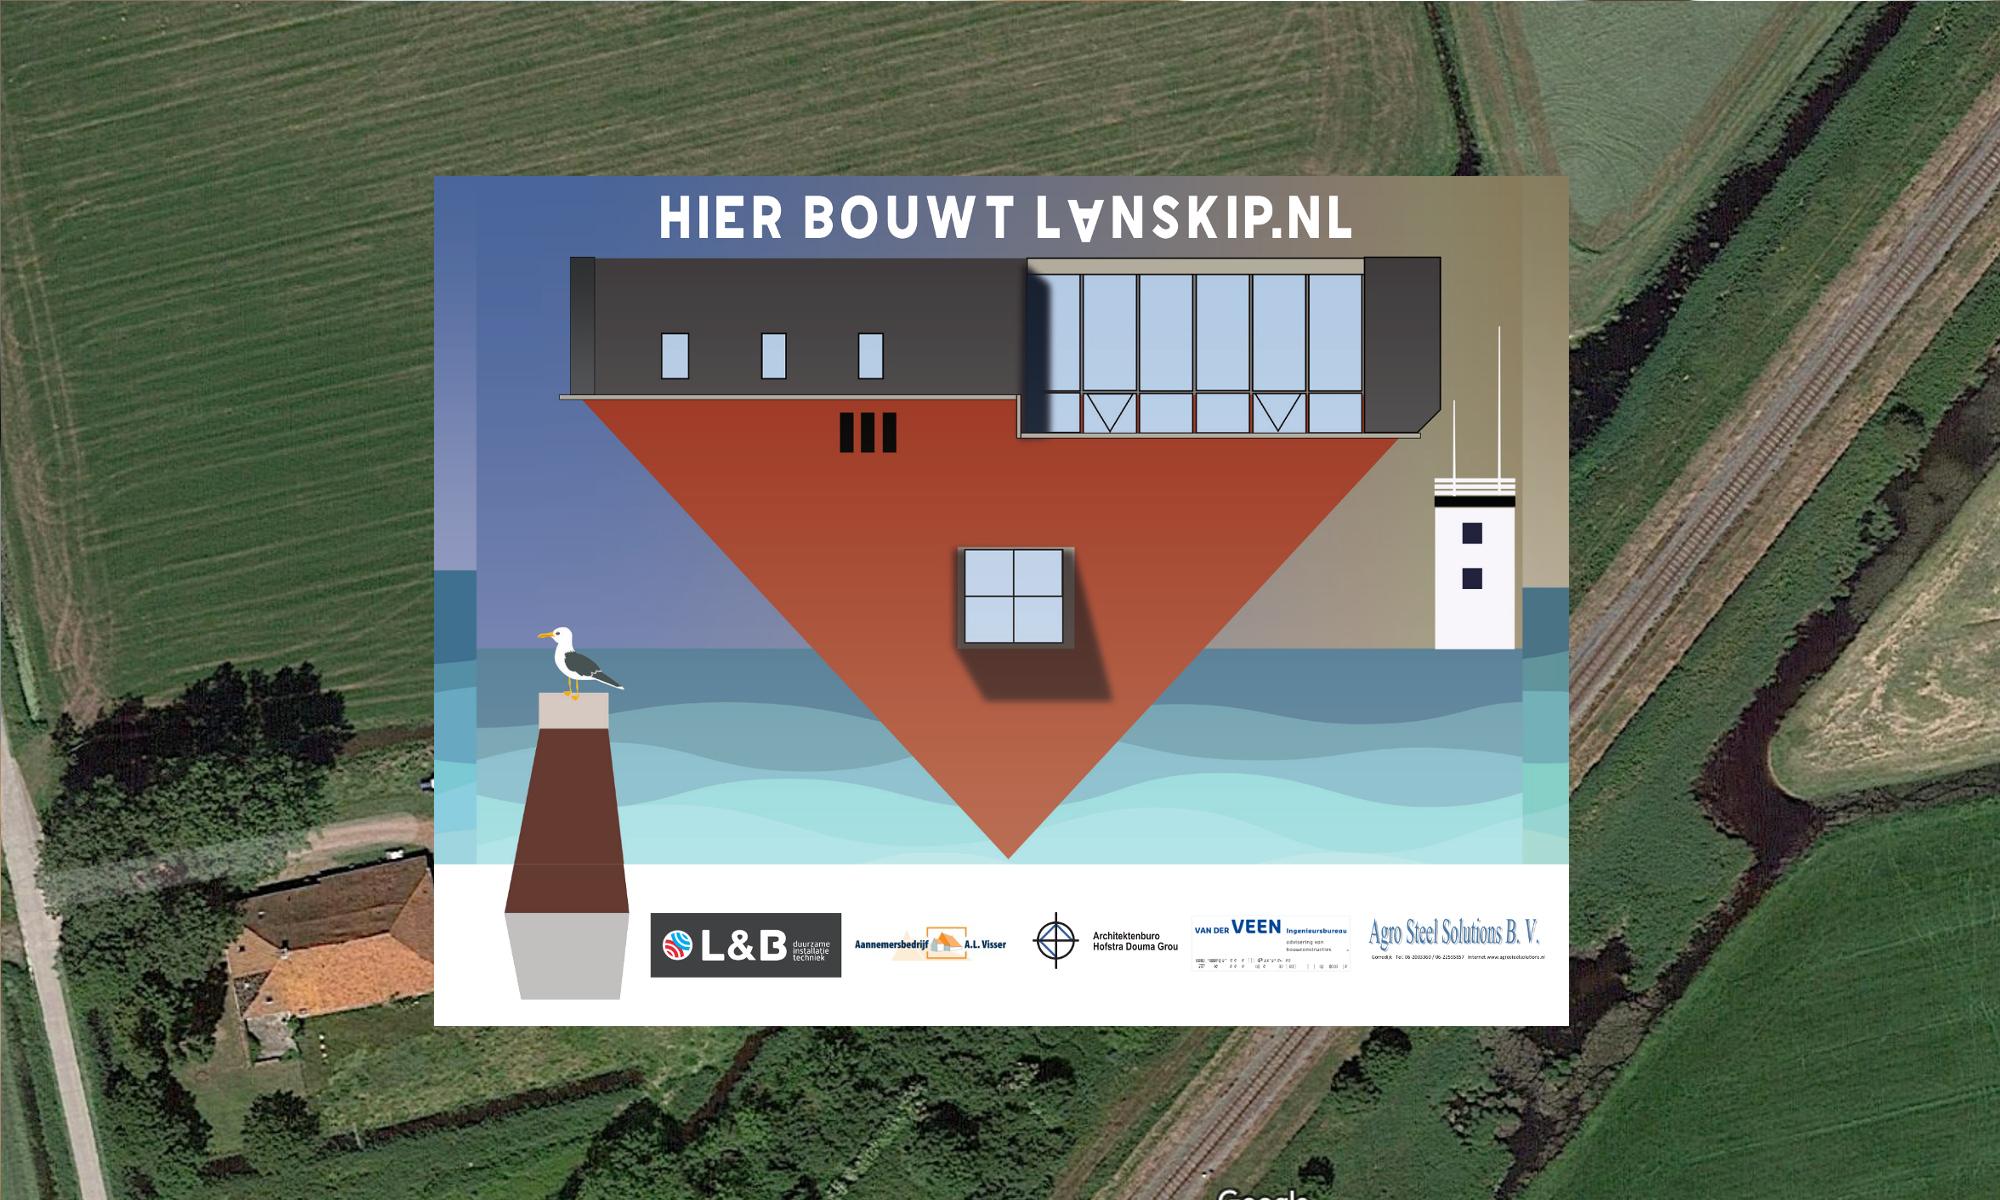 Hier bouwt Lanskip.nl